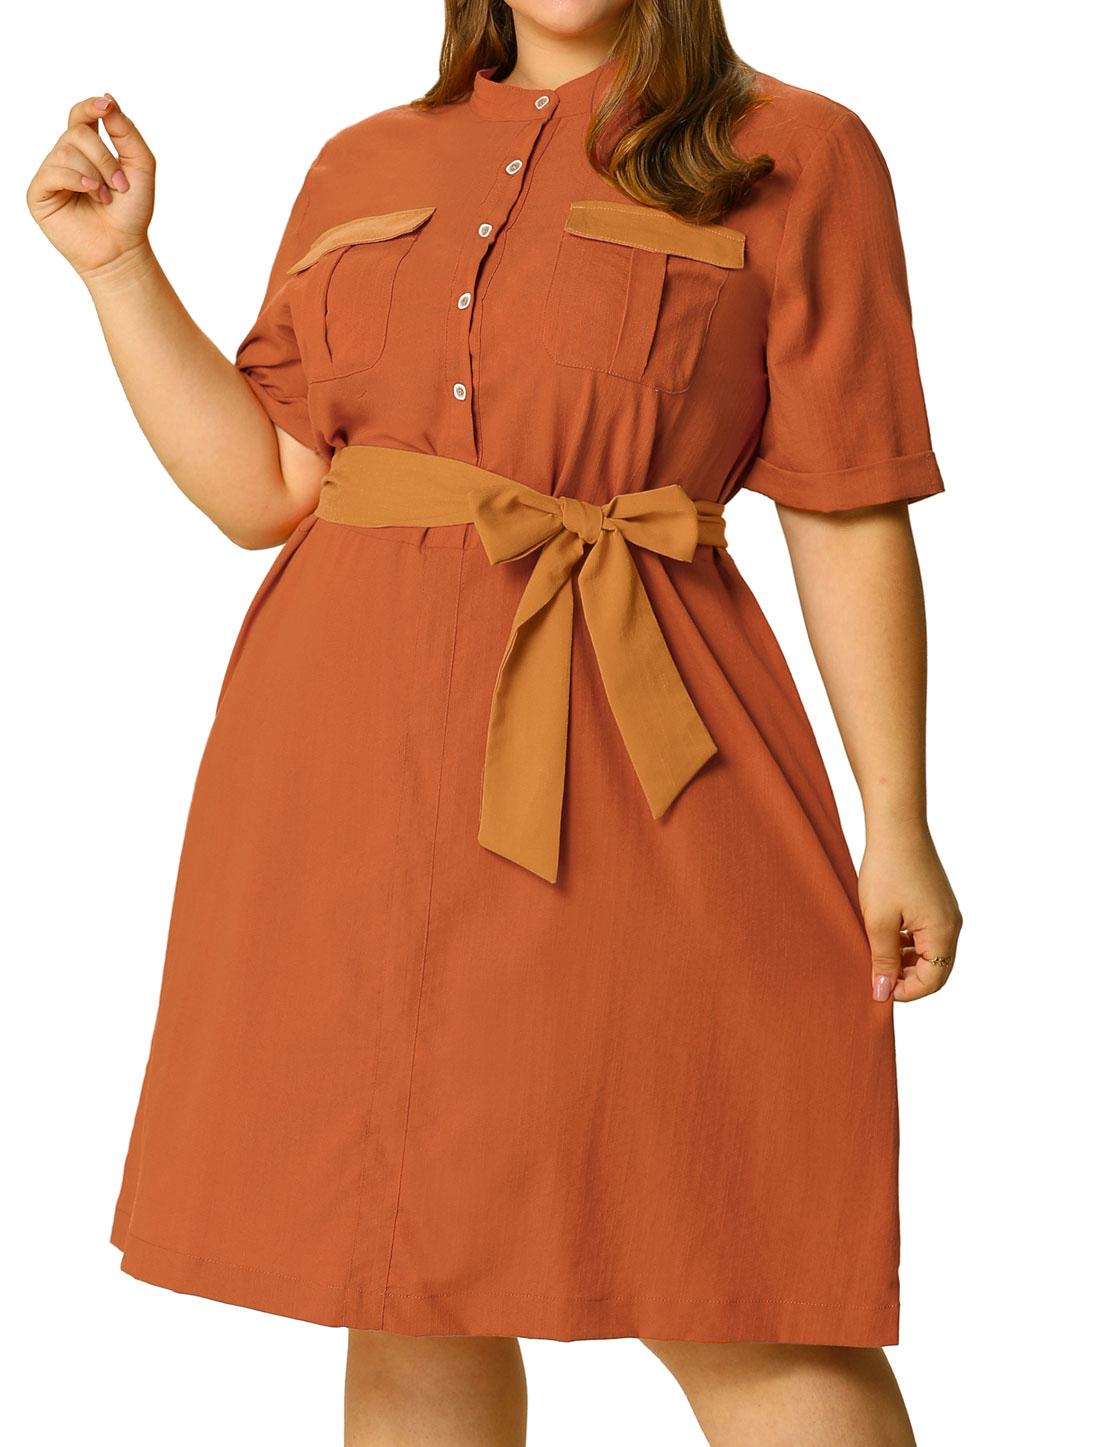 Women's Plus Size Tie Waist Belt Button Down Casual Midi Shirt Dress Orange 2X